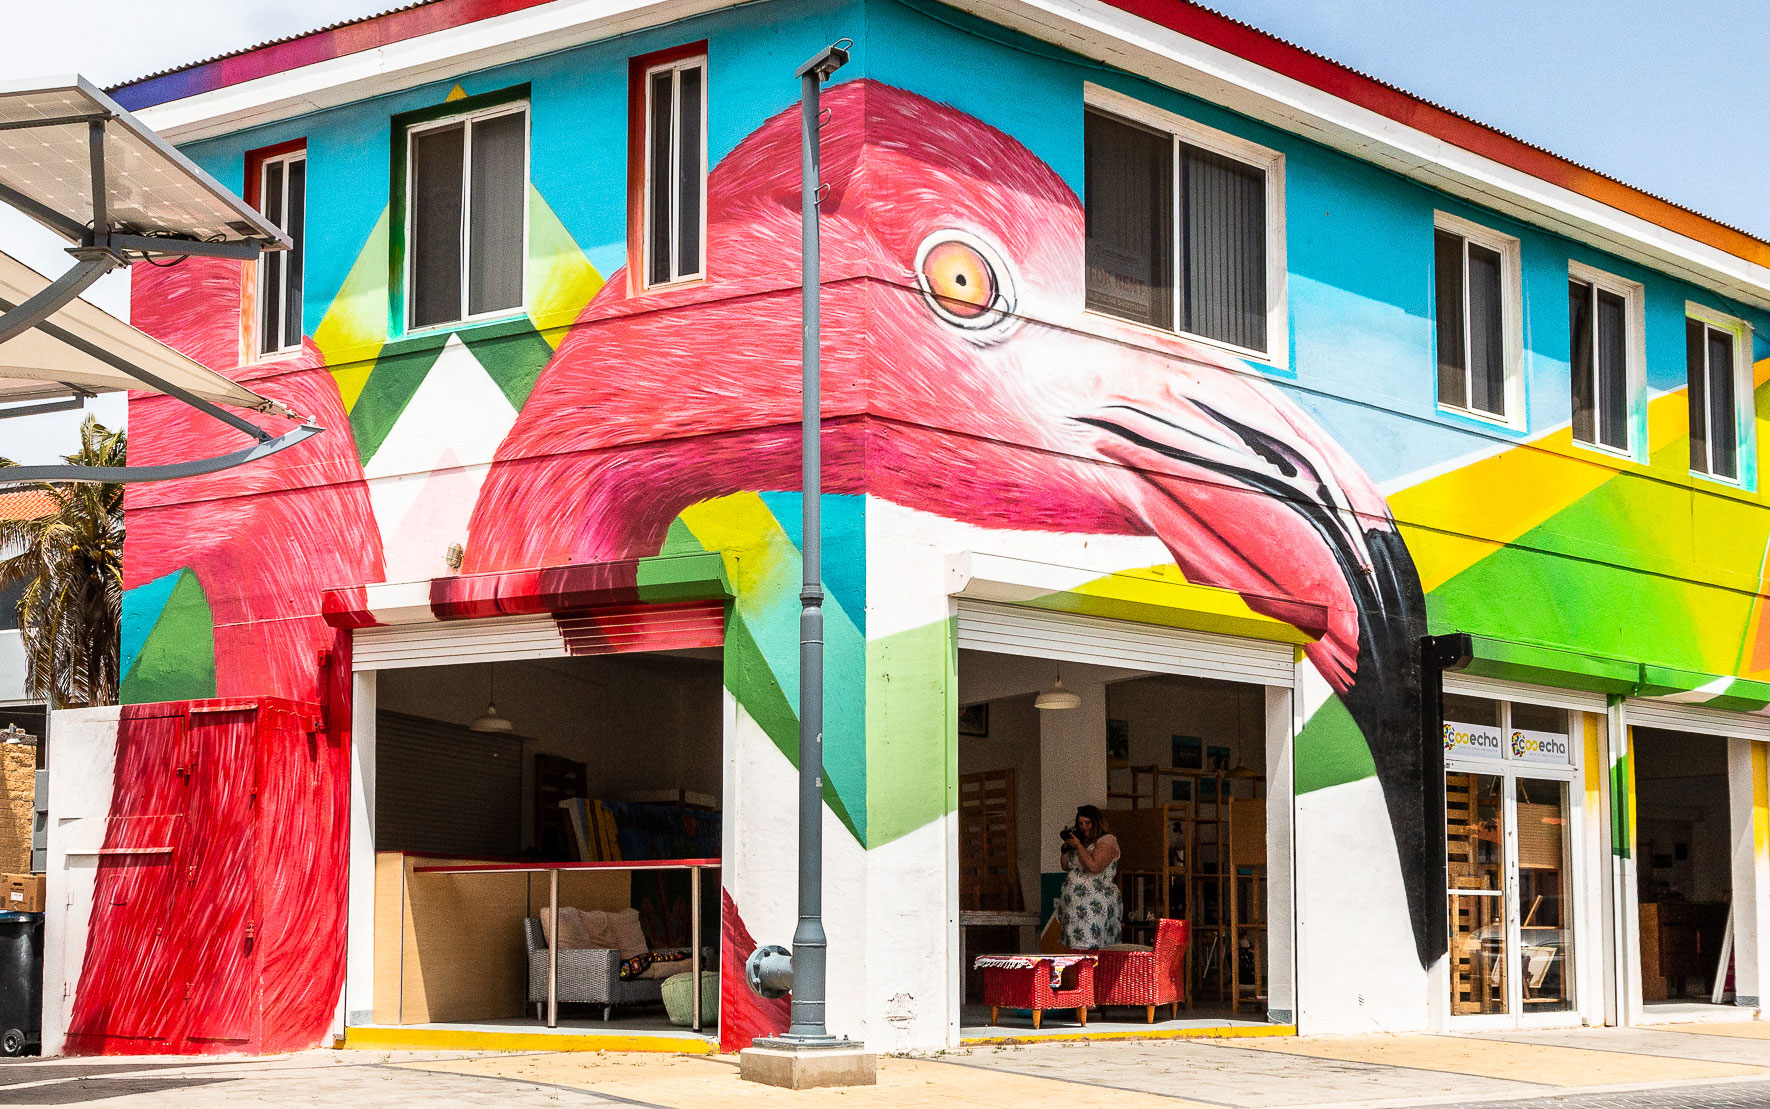 Street Art in St. Nicolas, Aruba. Flamingos